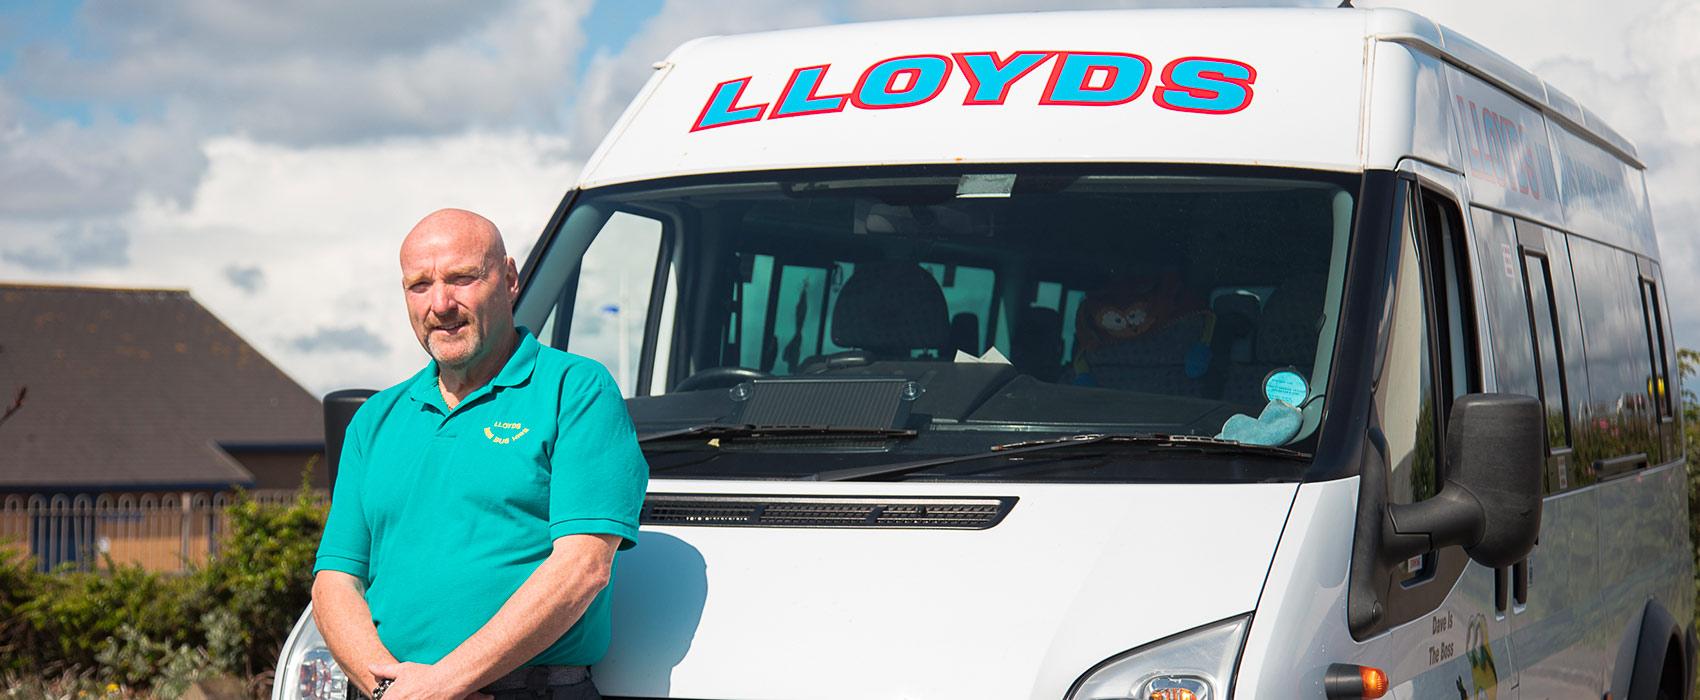 PML Supporting David of Lloyds Mini Bus Hire